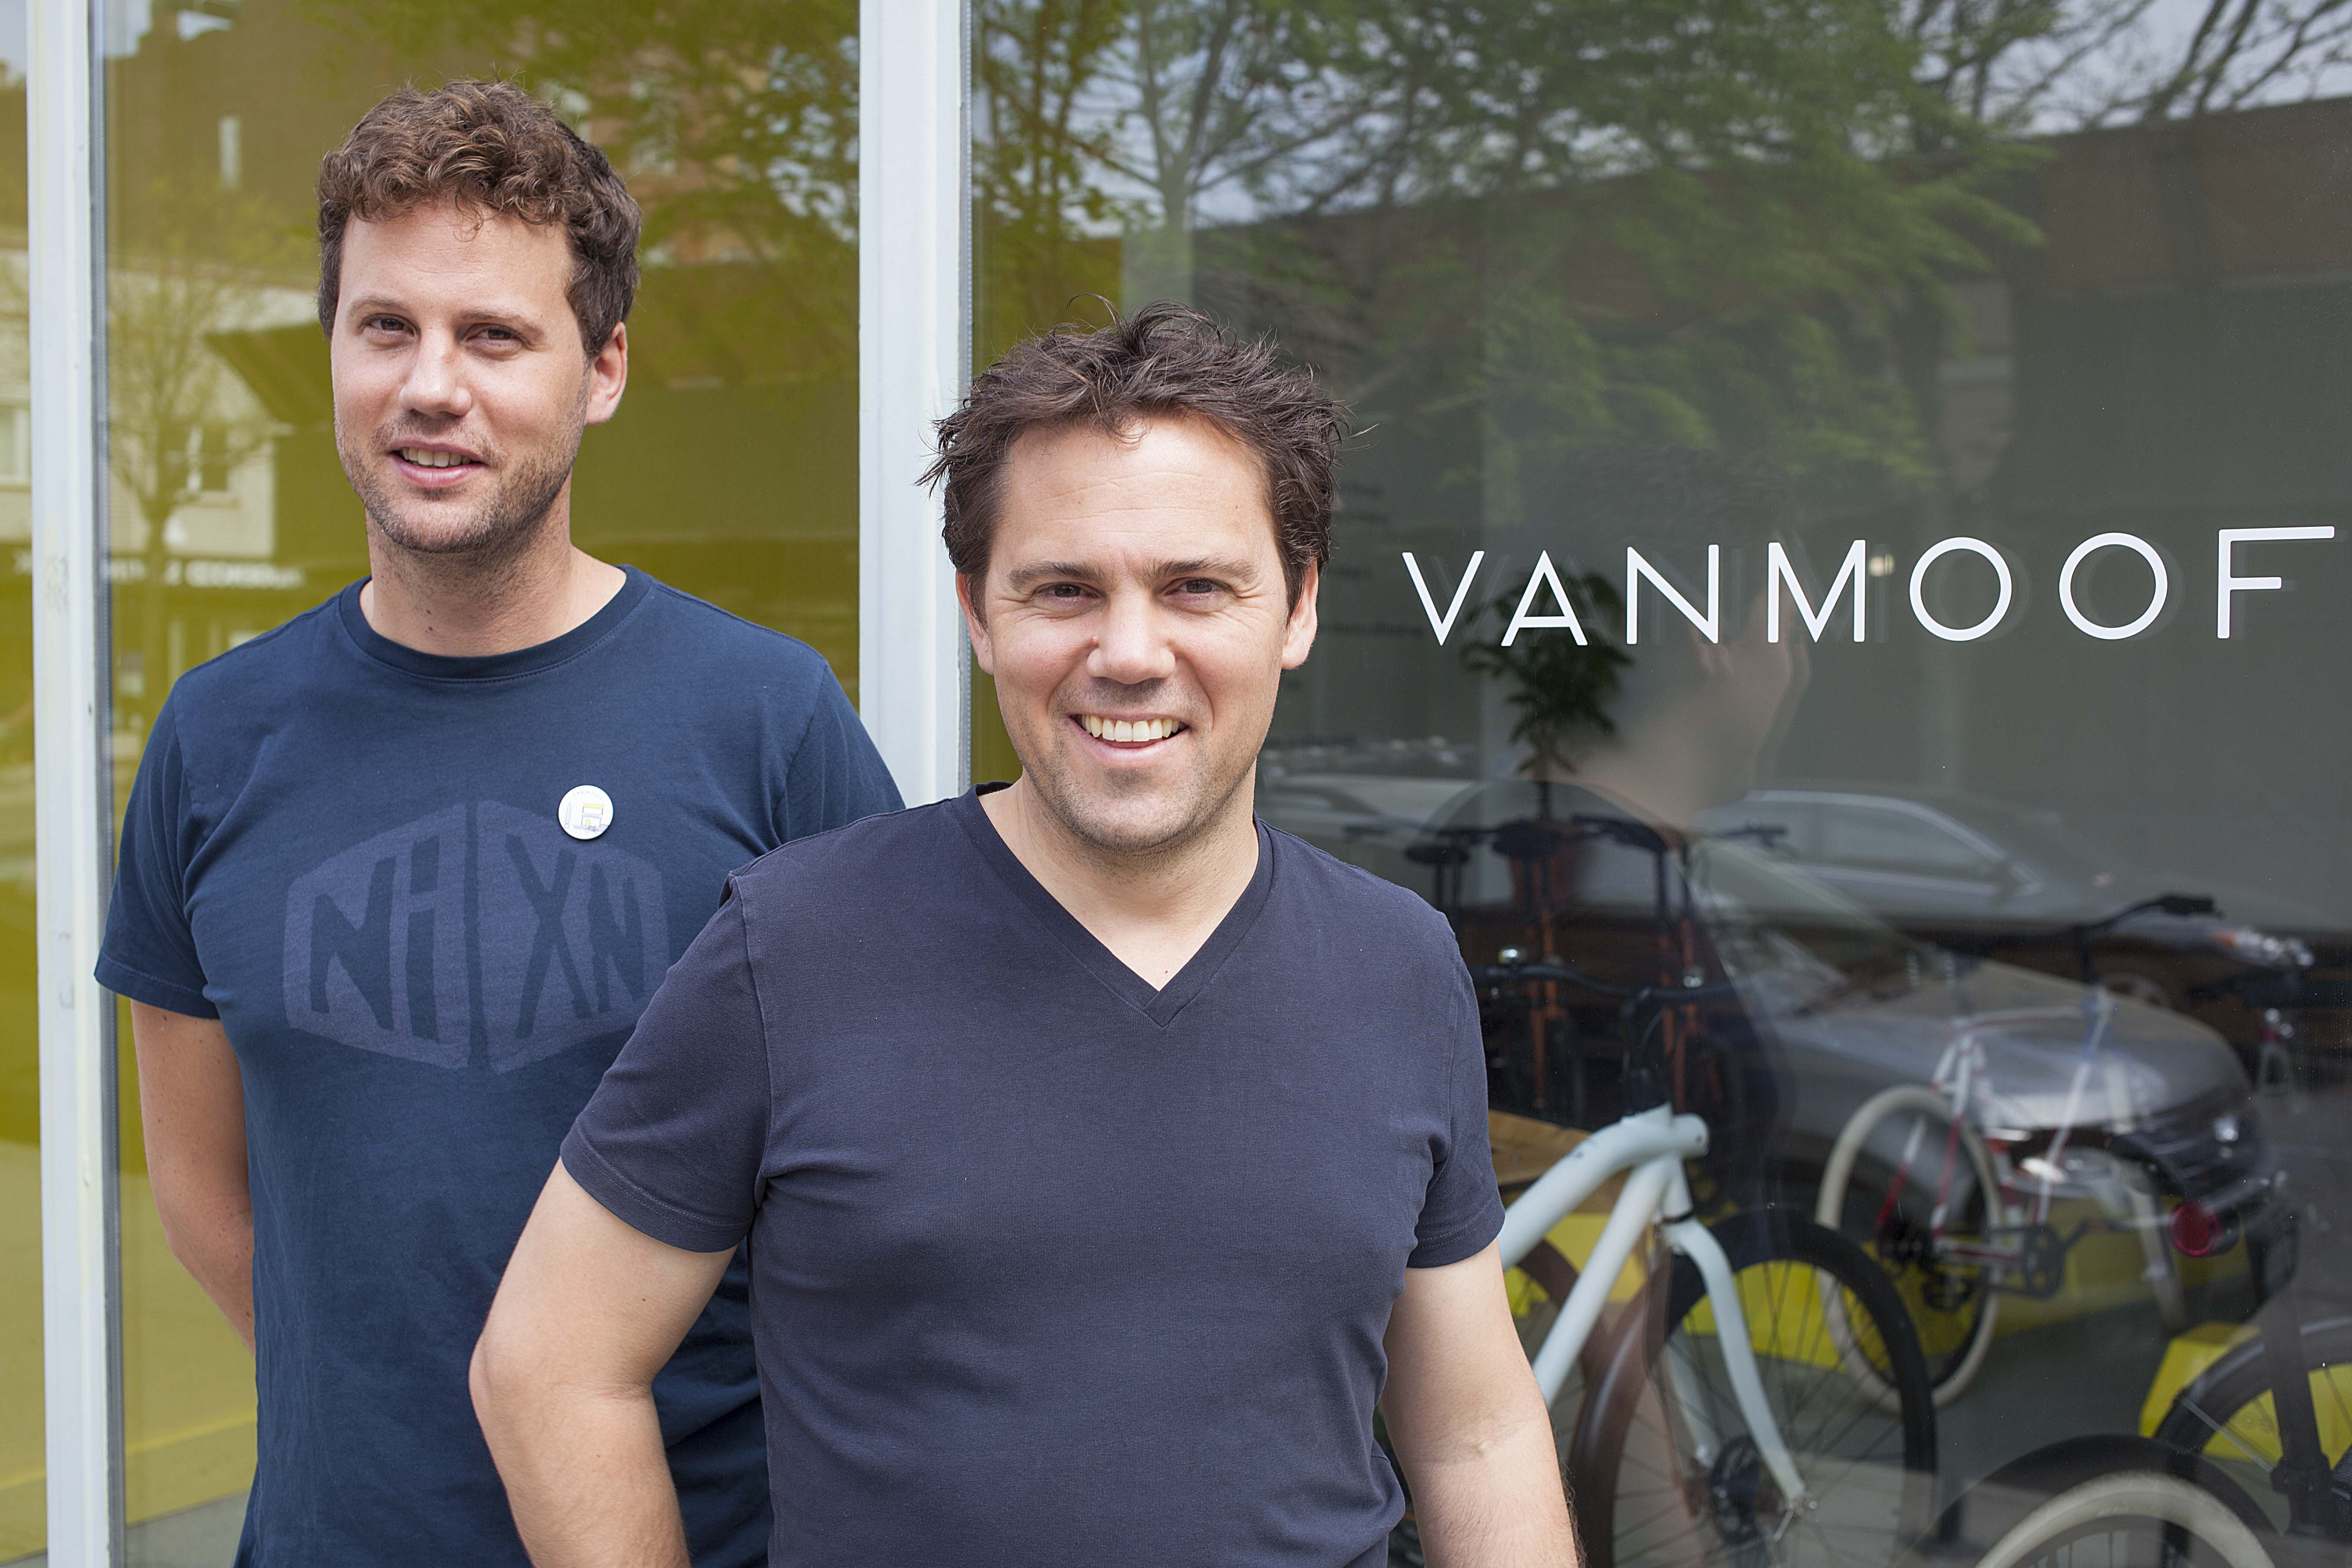 Fans steken 2,5 miljoen in fietsmerk VanMoof